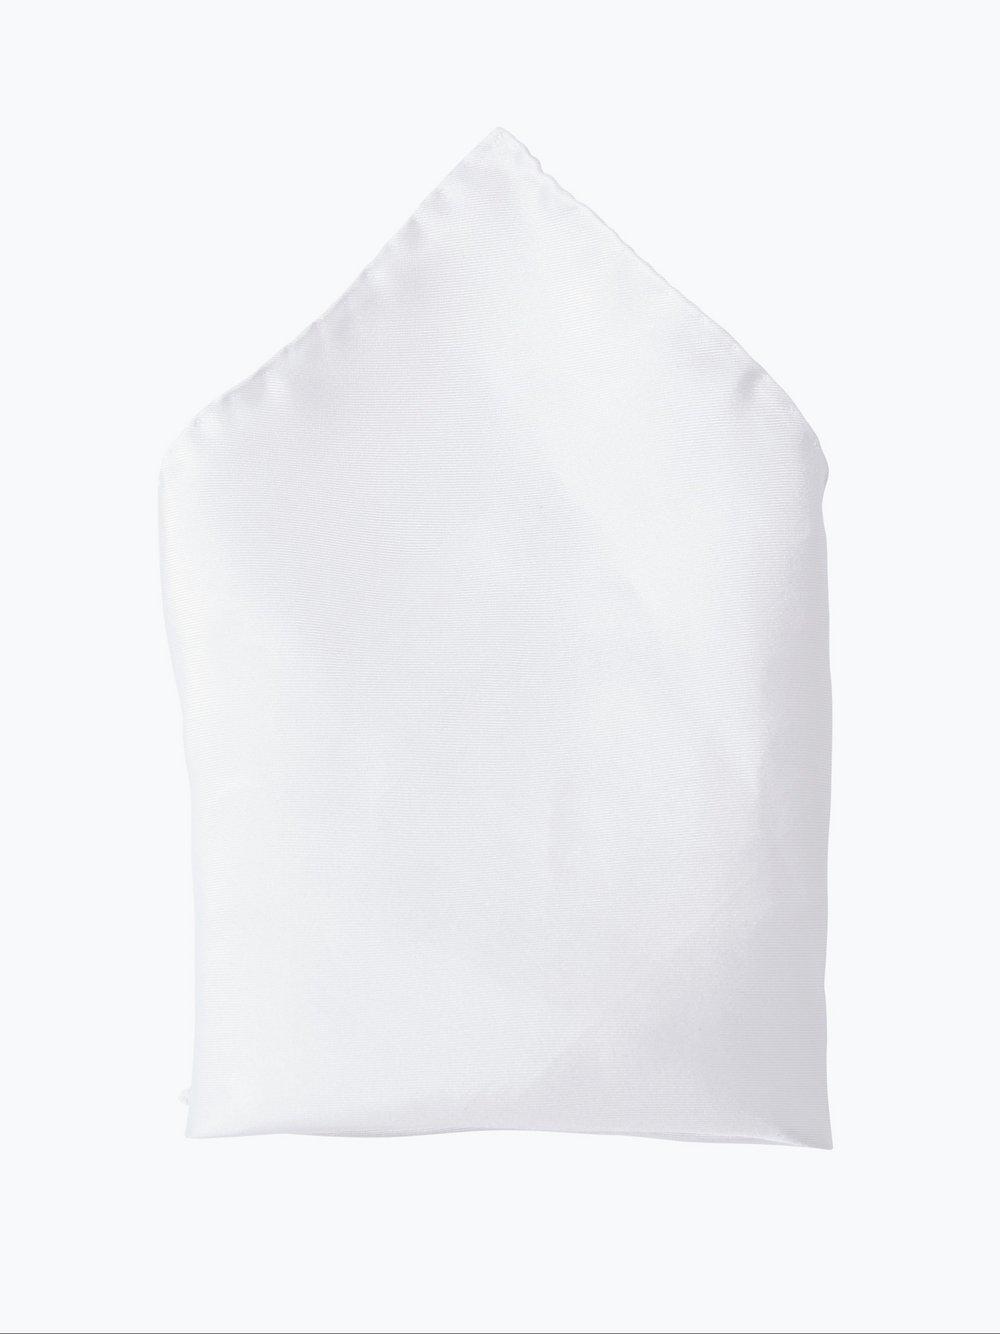 Andrew James – Poszetka jedwabna męska, biały Van Graaf 102855-0002